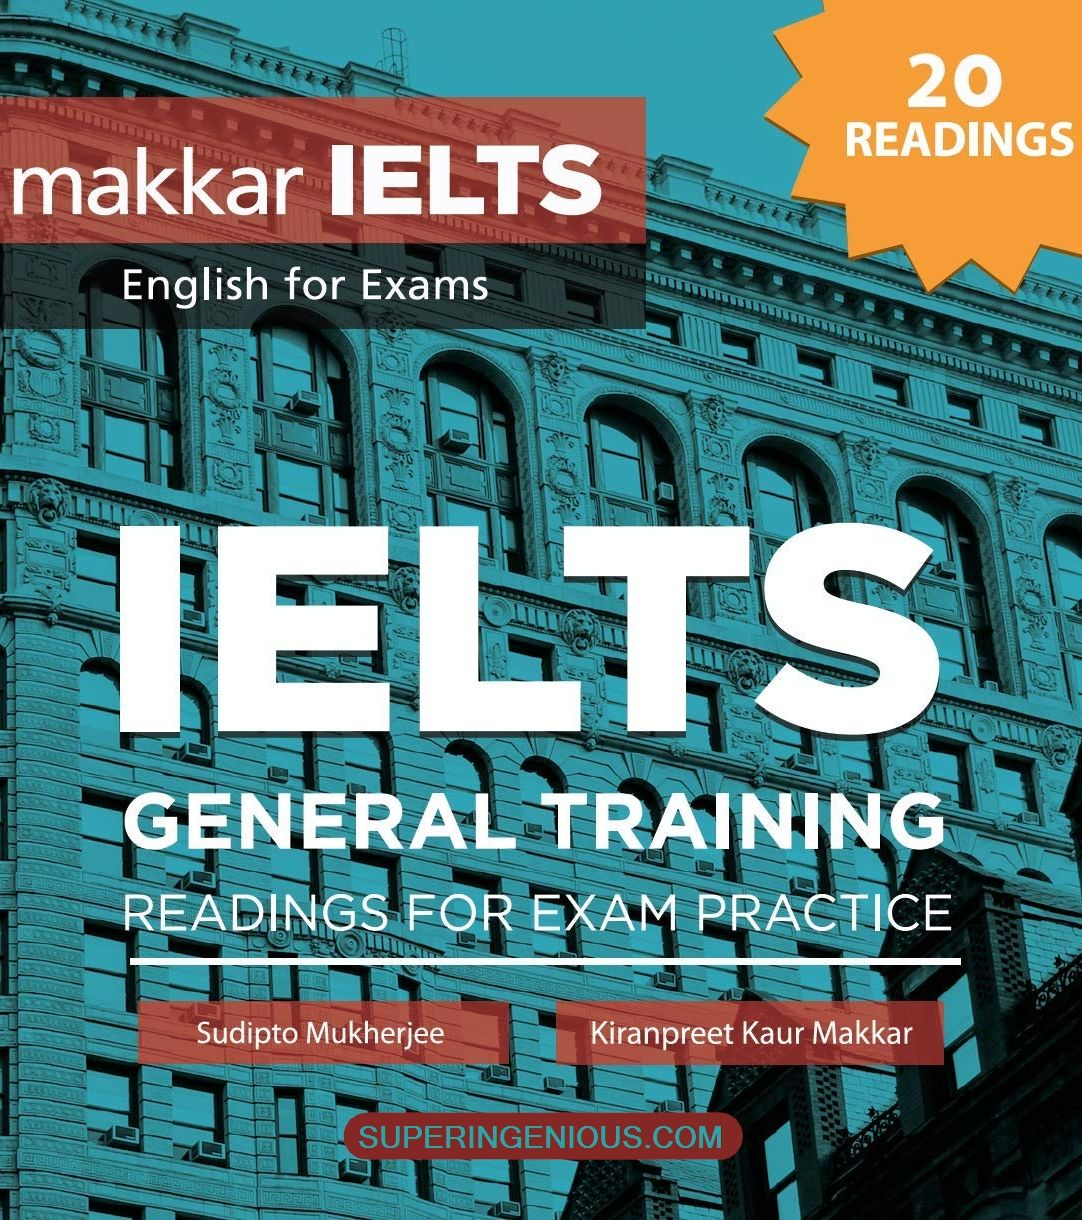 Pin On Ielts Ielts general training reading practice